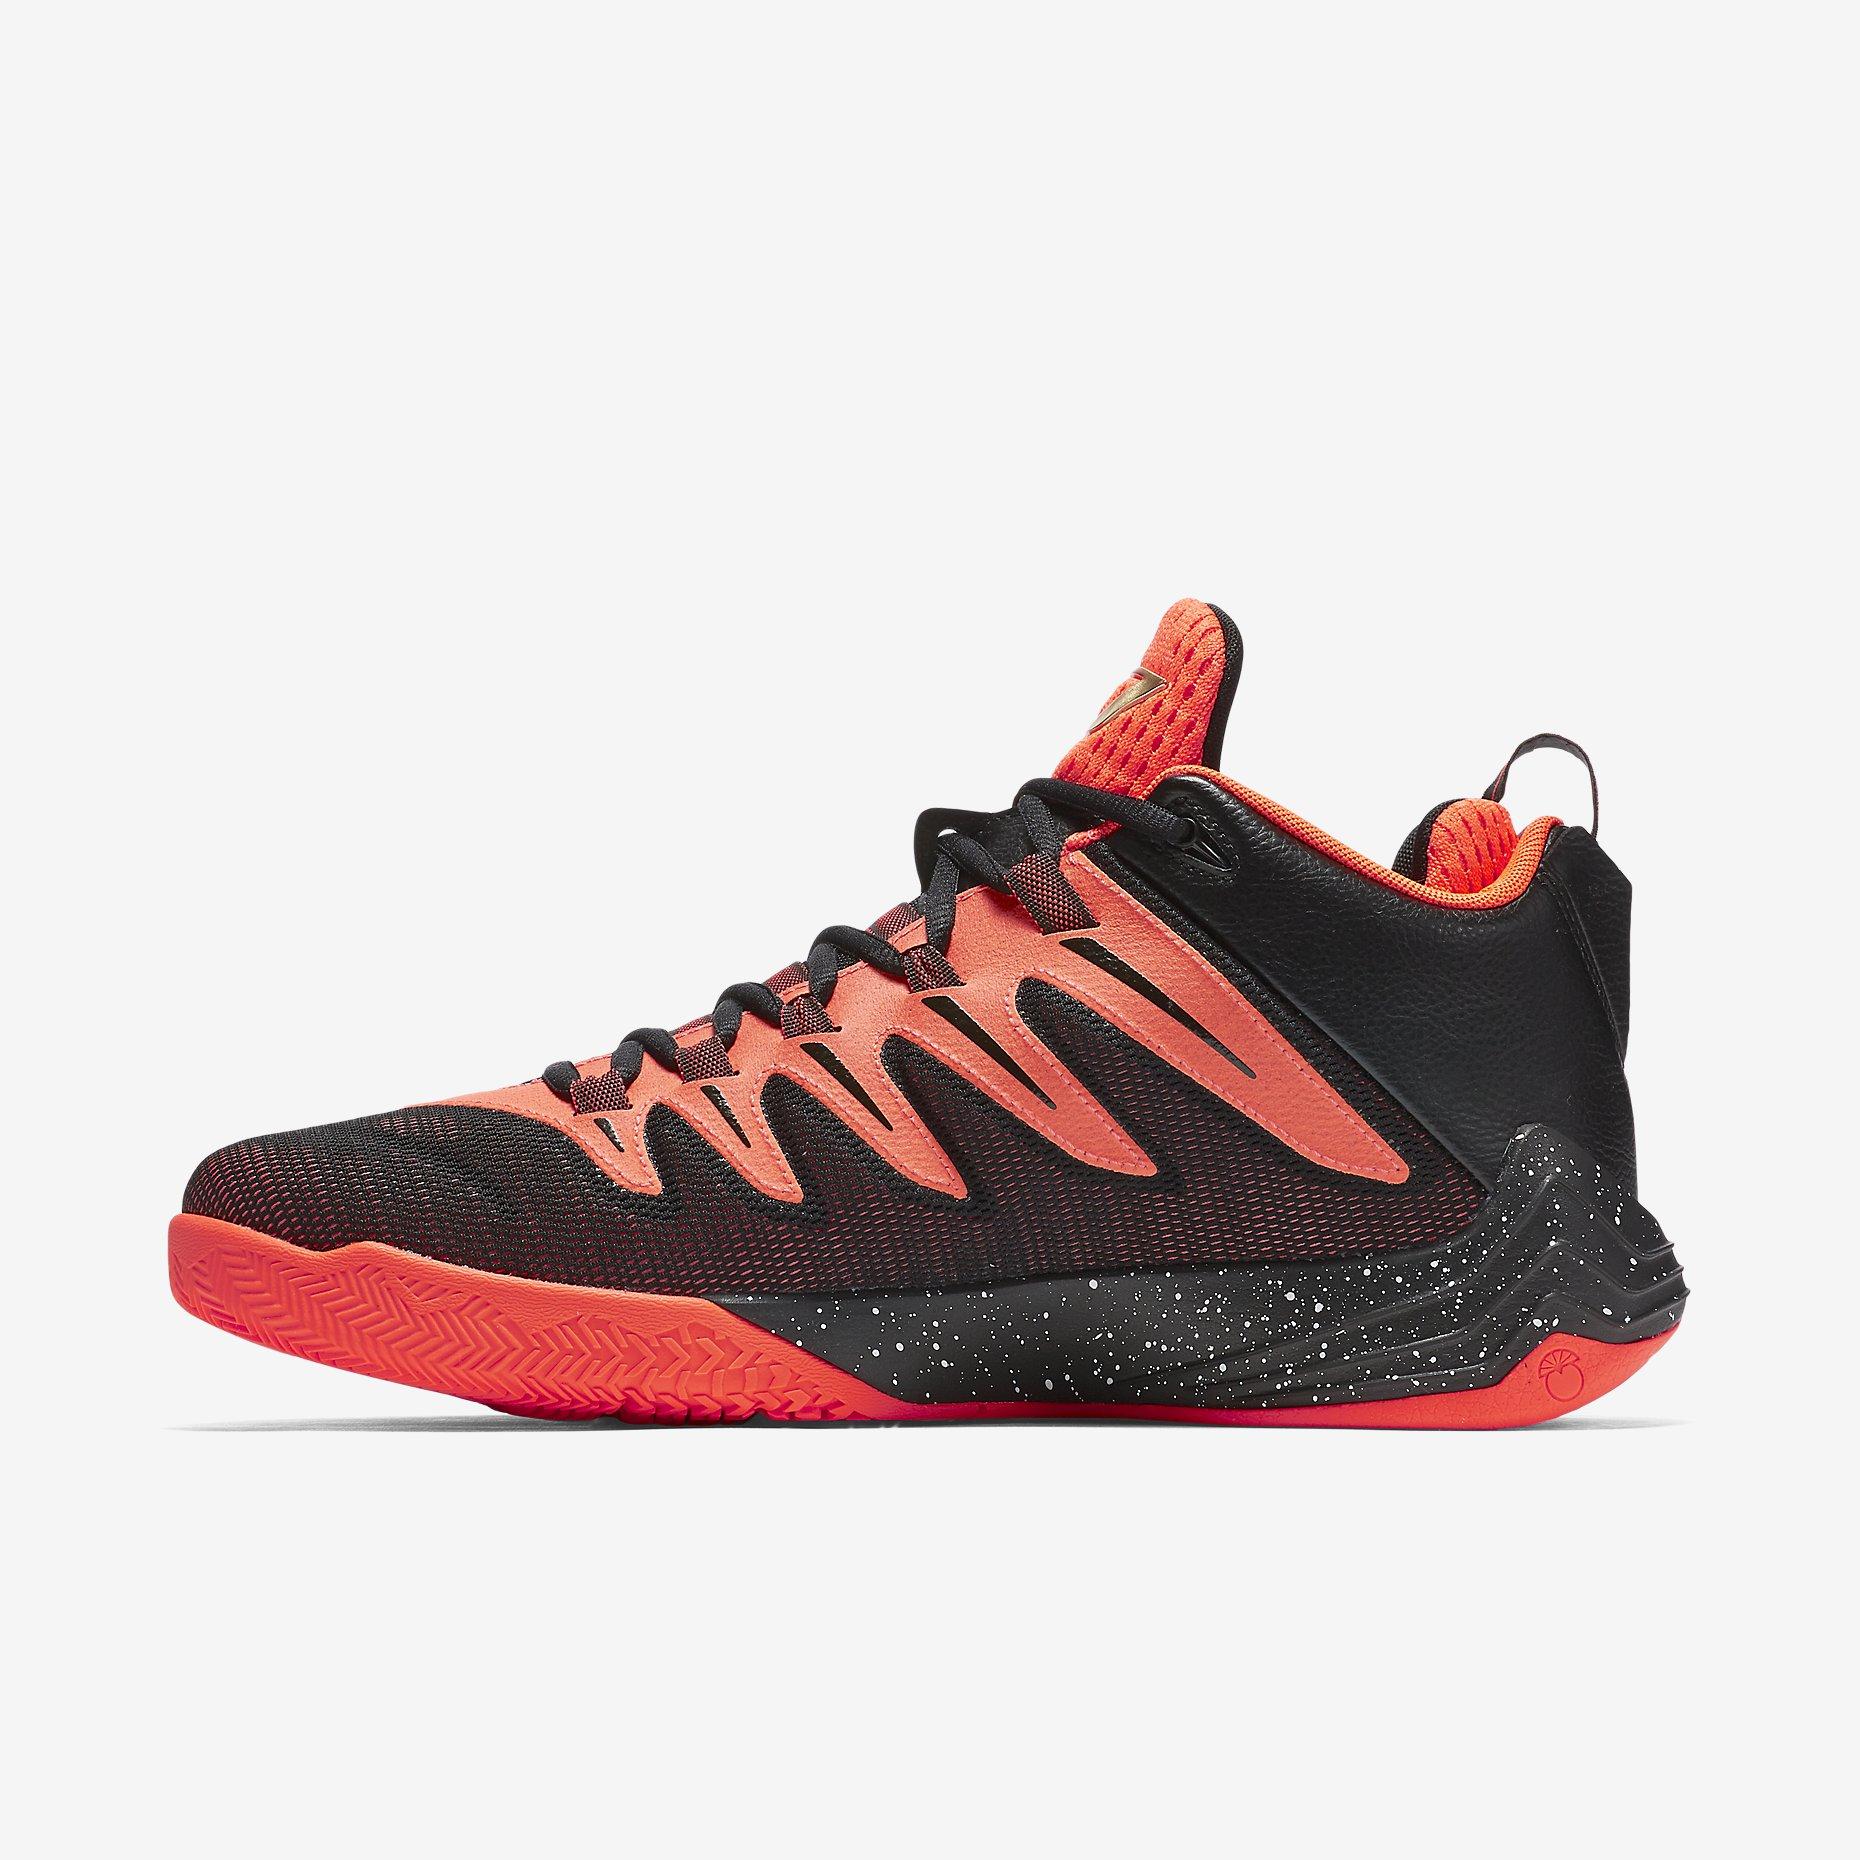 timeless design 32088 a0193 Get Quotations · Nike nike men s shoes jordan CP3.IX x jordan men s  basketball shoes 829217-003